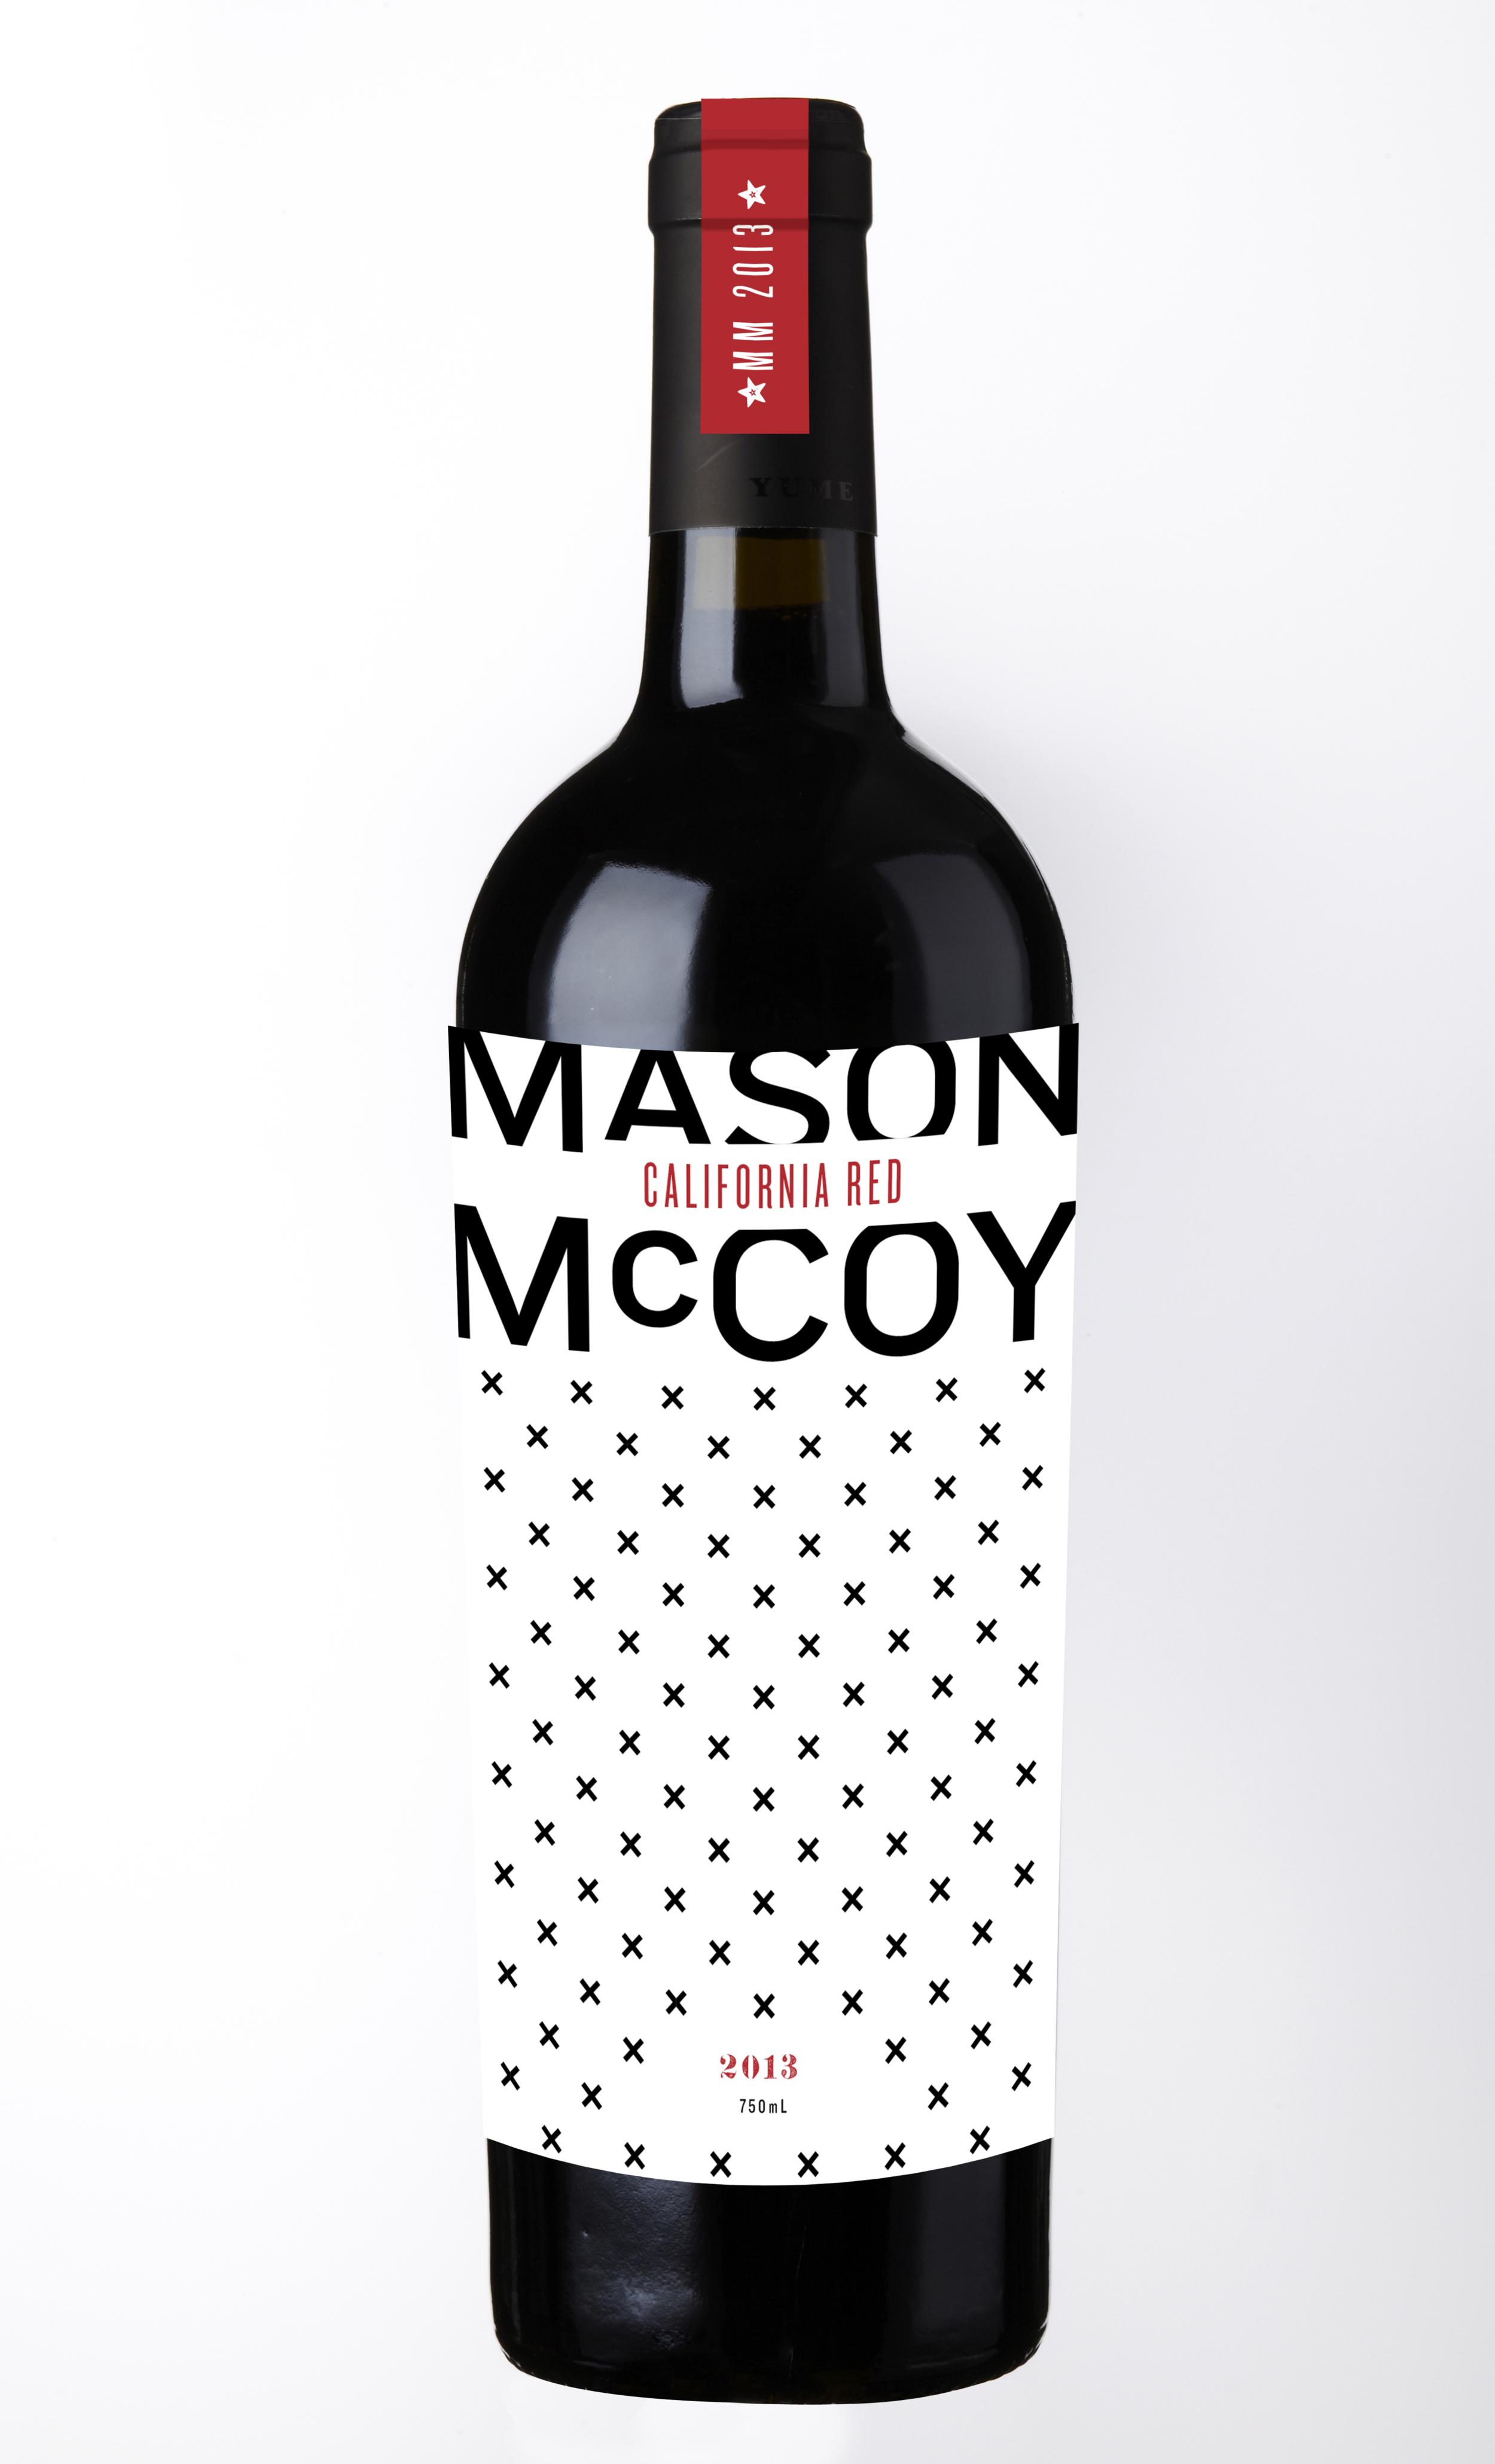 MasonMcCoyv6.png